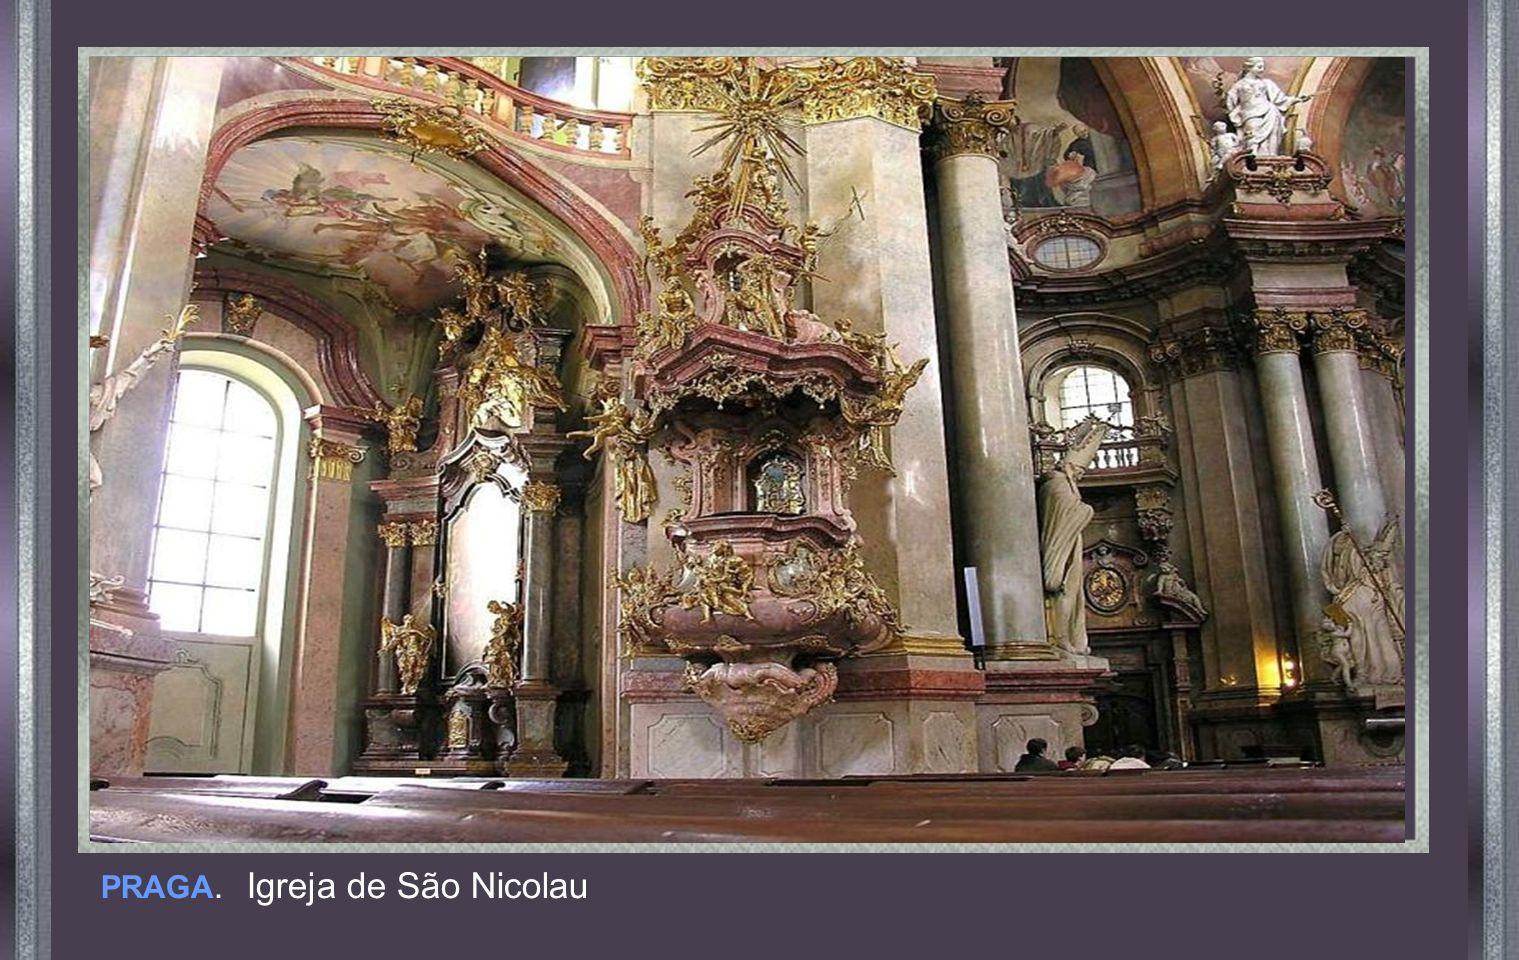 PRAGA. Igreja de São Nicolau